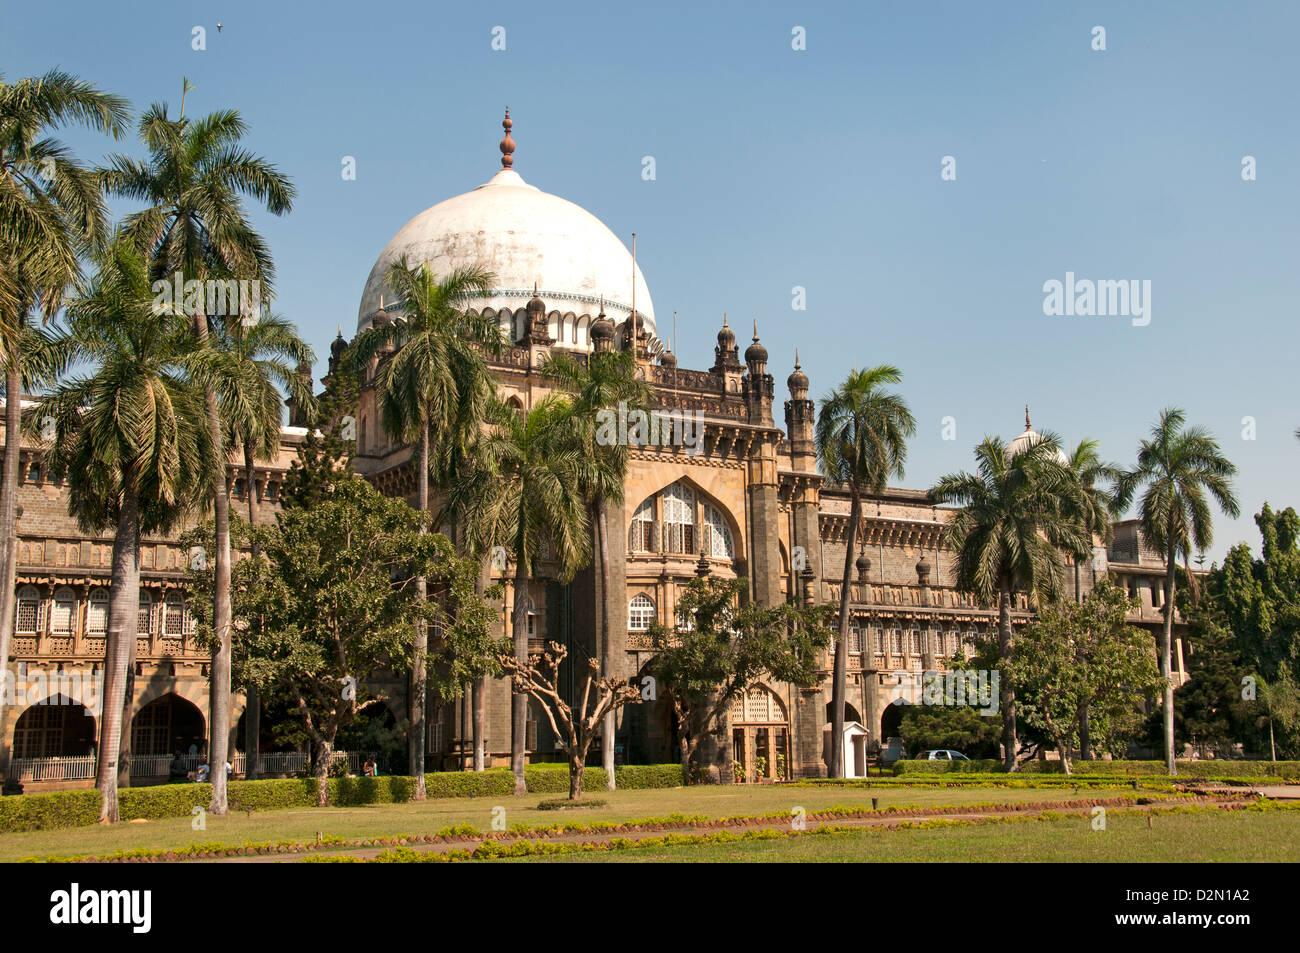 Der Chhatrapati Shivaji Maharaj Vastu Sangrahalaya früher Prince Of Wales Museum der westlichen Indien Mumbai Stockbild